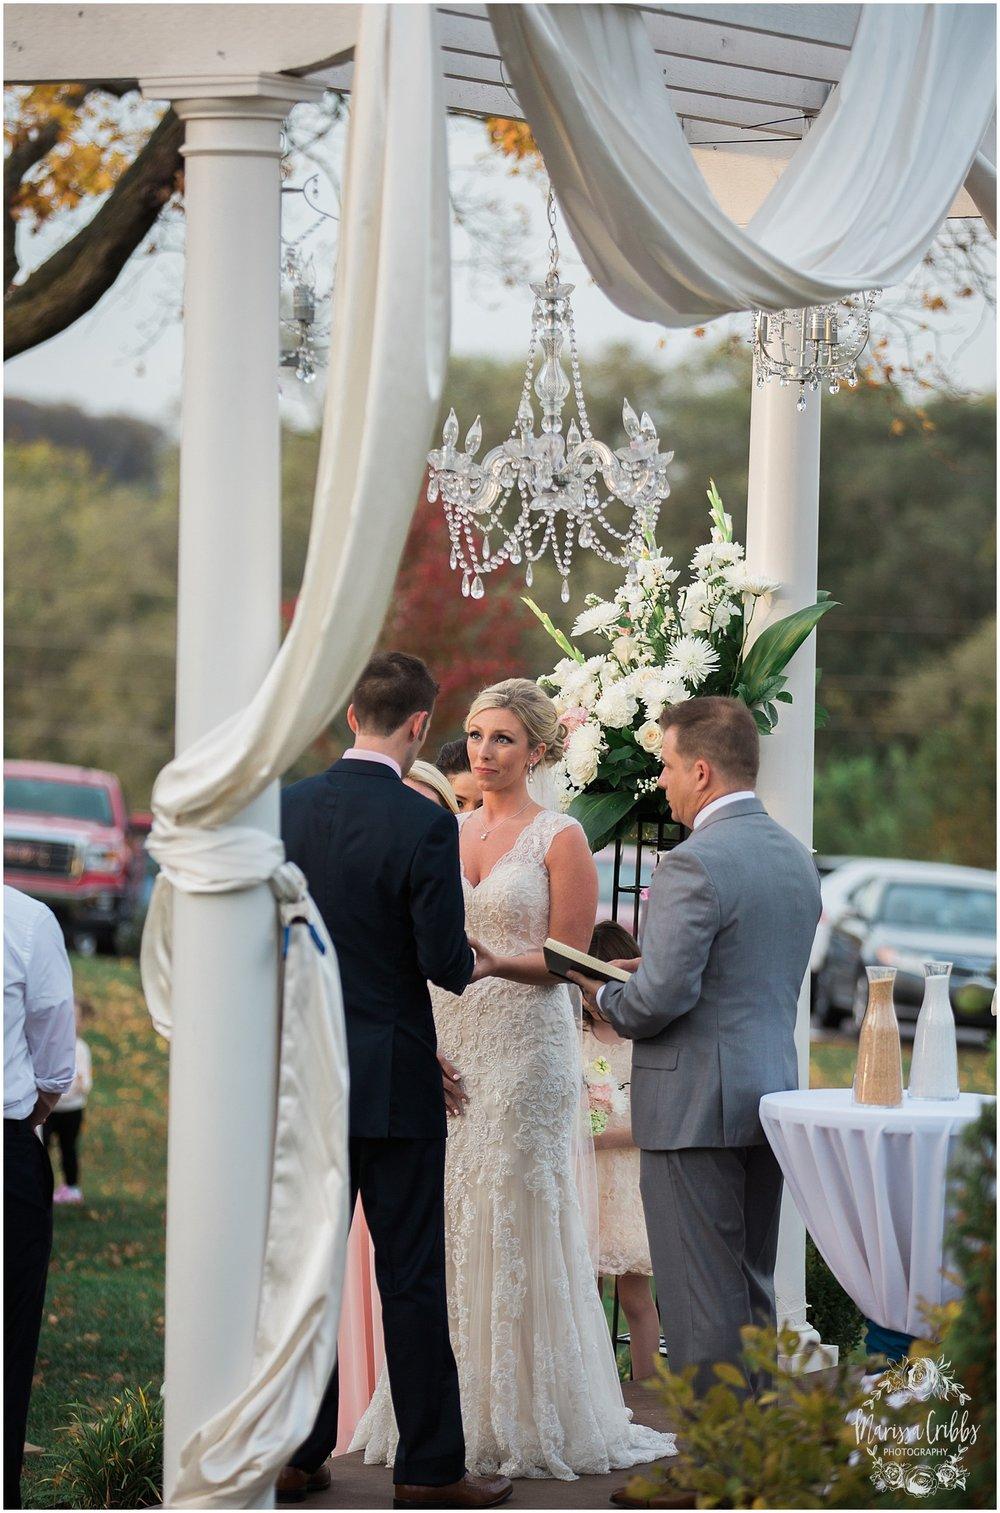 Alex & Amie | Eighteen Ninety Event Space | Marissa Cribbs Photography | Kansas City Perfect Wedding Guide_1350.jpg